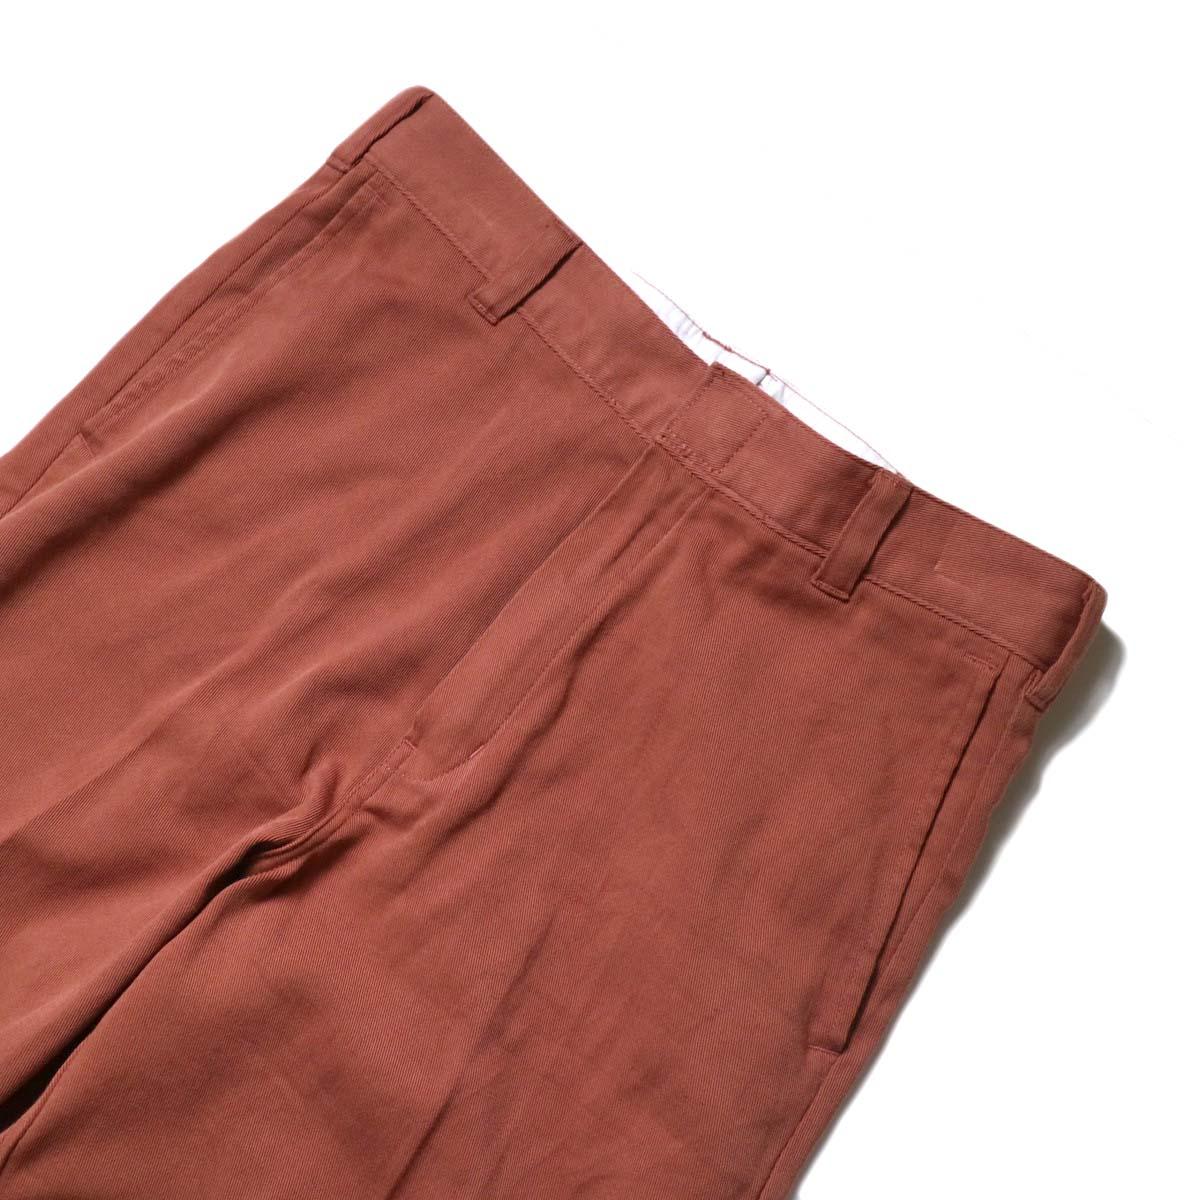 UNUSED × Dickies / UW0939 Cotton Linen Trousers (Orange)ウエスト